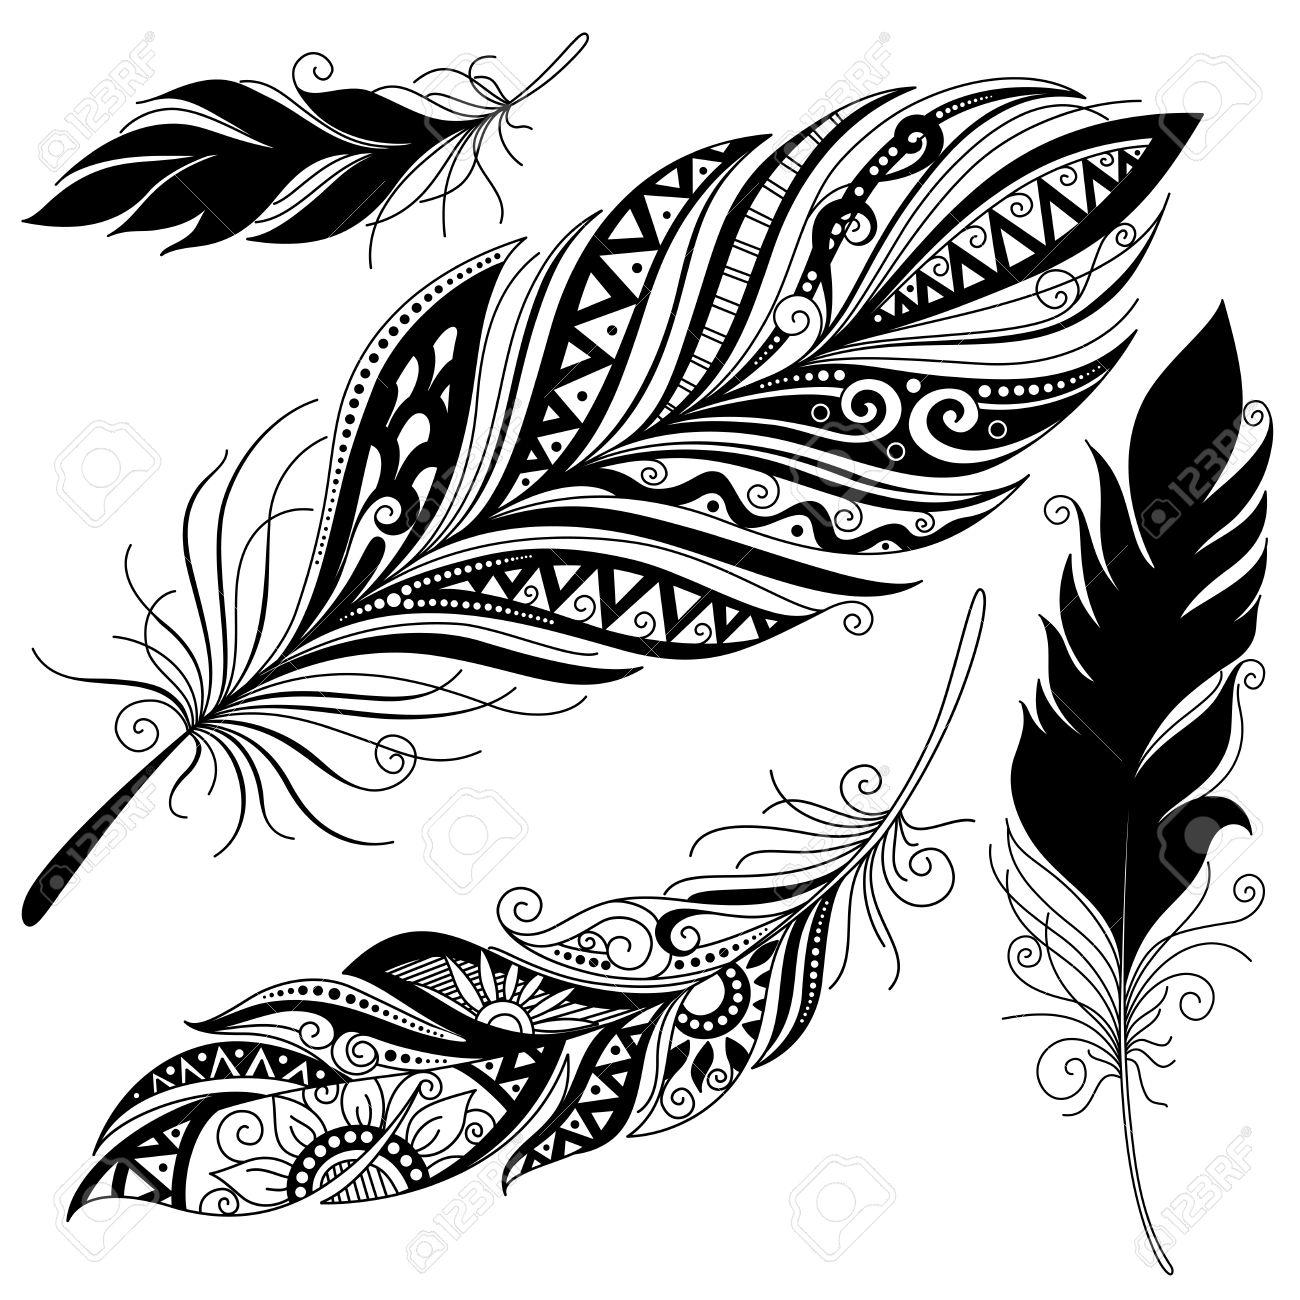 Isolated Set of black ethnic tribal feathers.